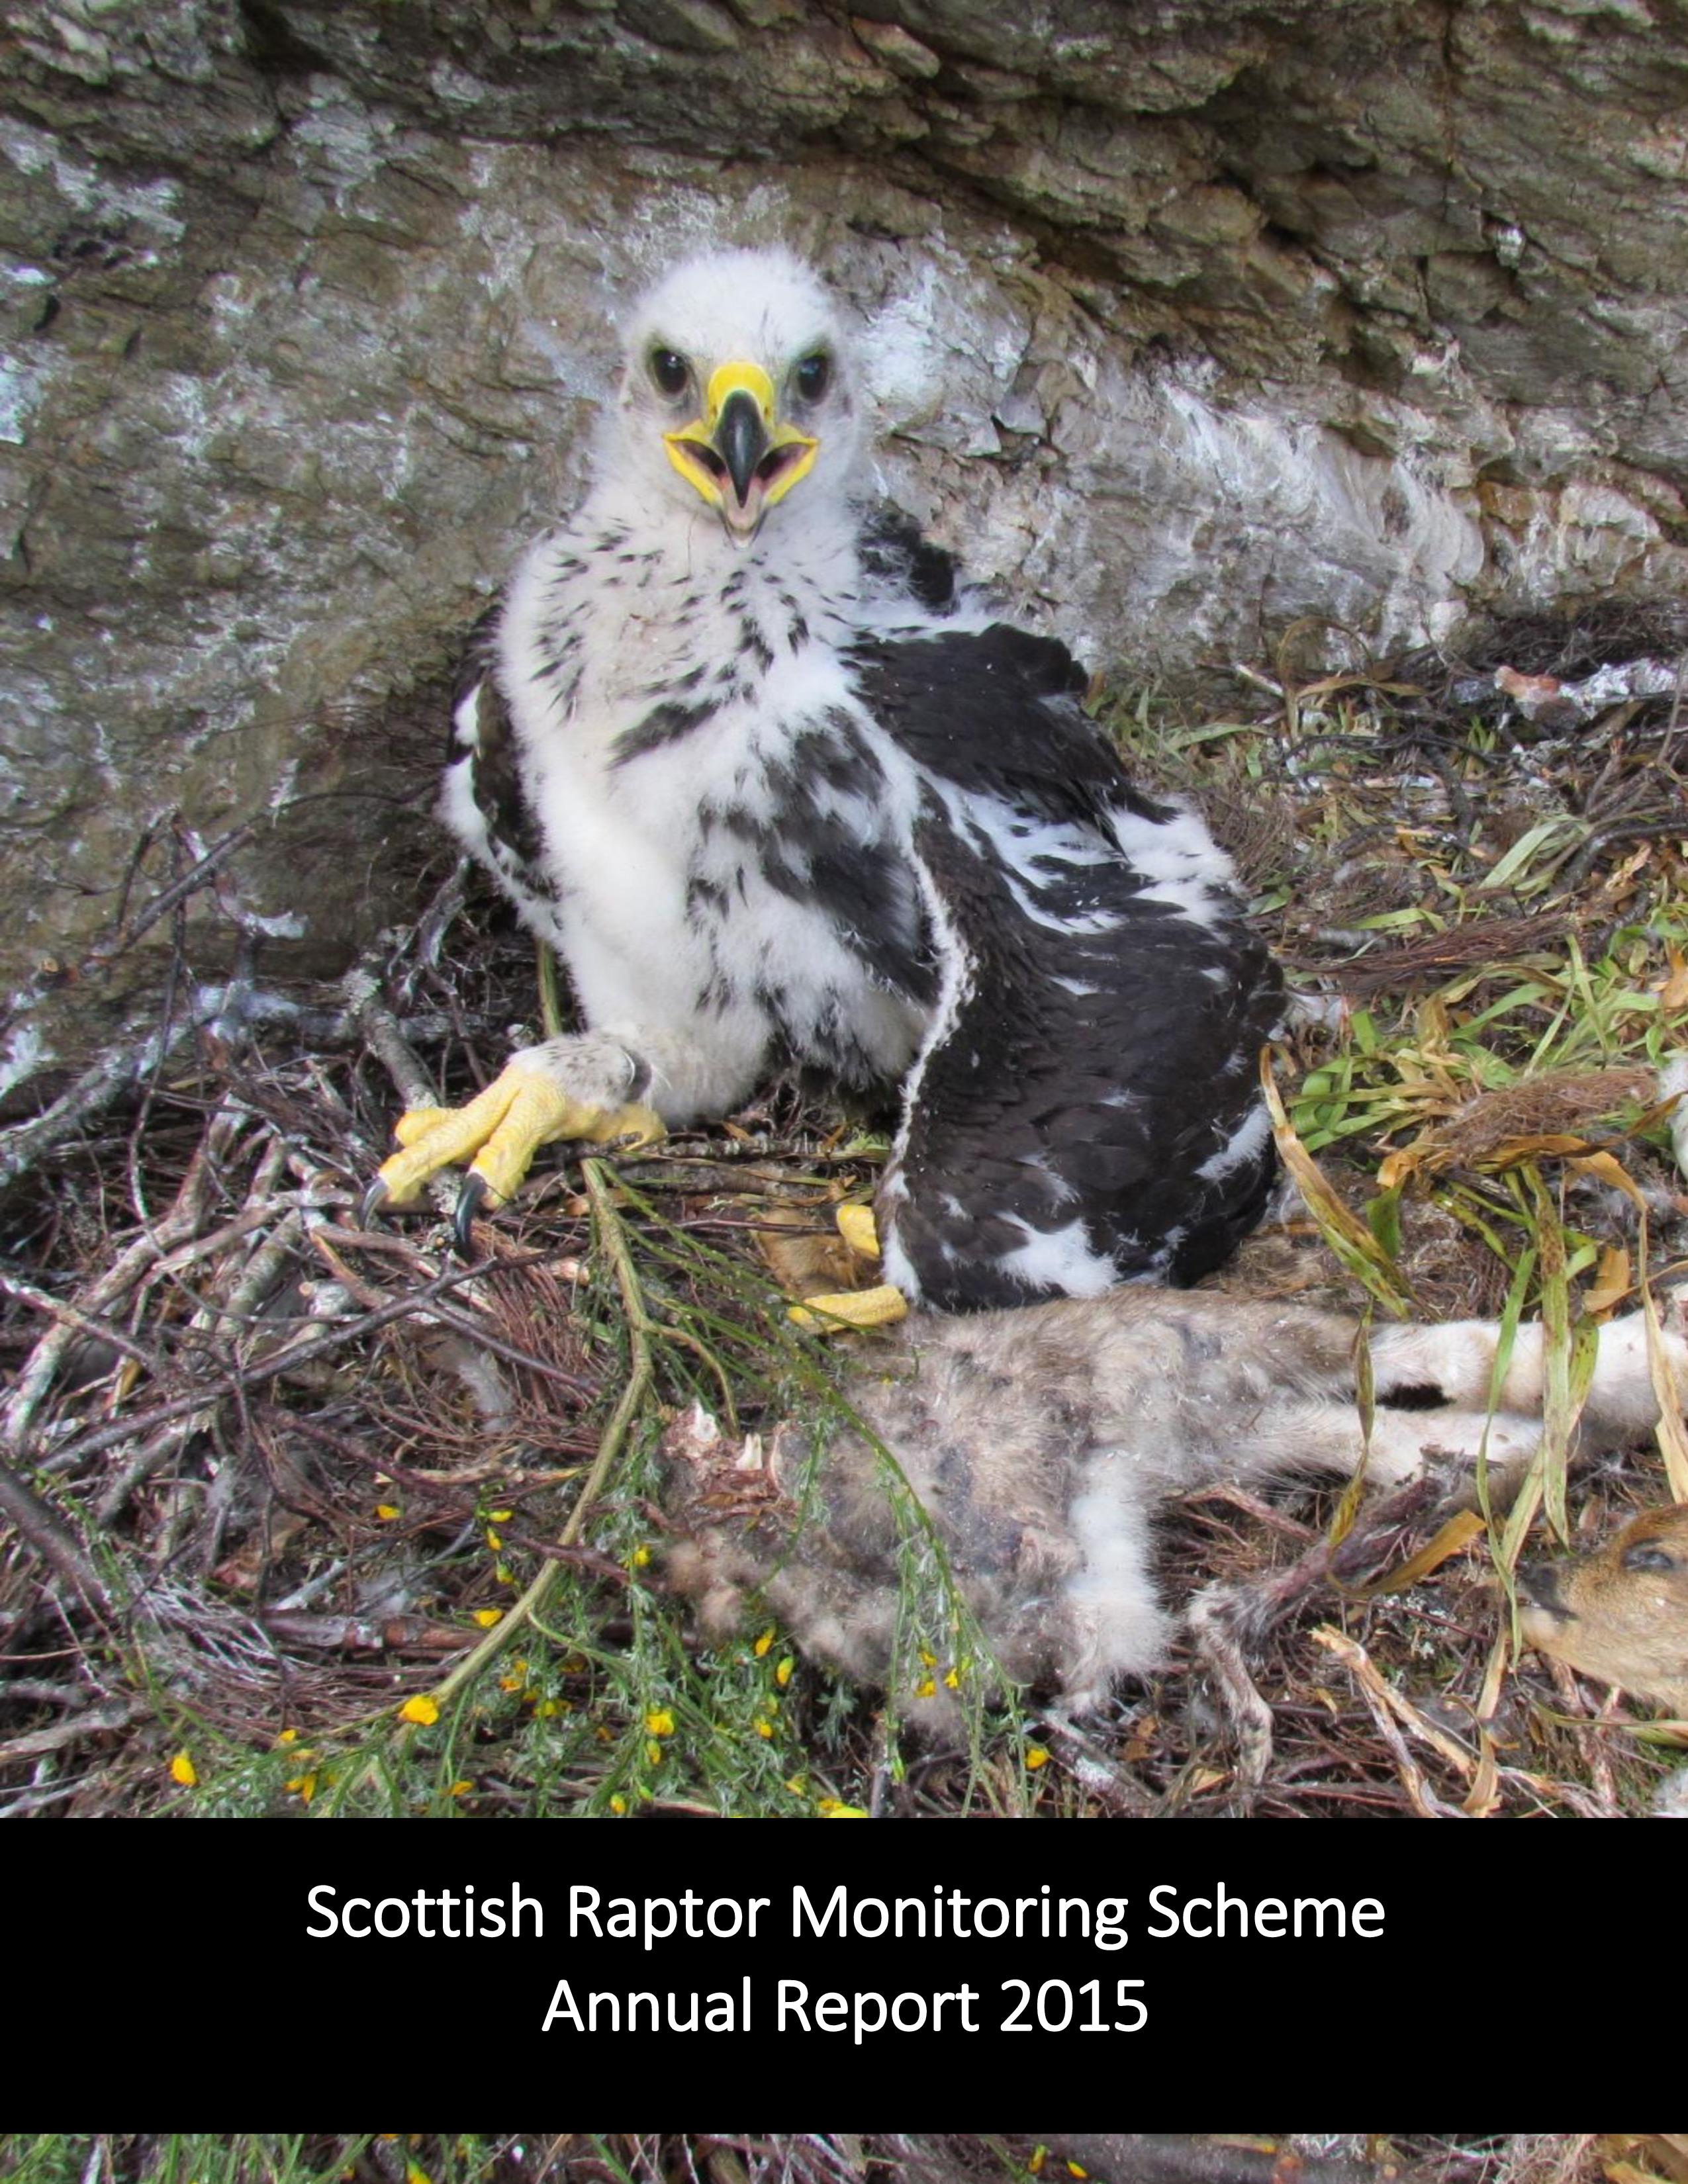 Challis, A., Wilson, M.W., Holling, M., Roos, S., Stevenson, A. & Stirling-Aird, P. (2016). Scottish Raptor Monitoring Scheme Report 2015. BTO Scotland, Stirling.